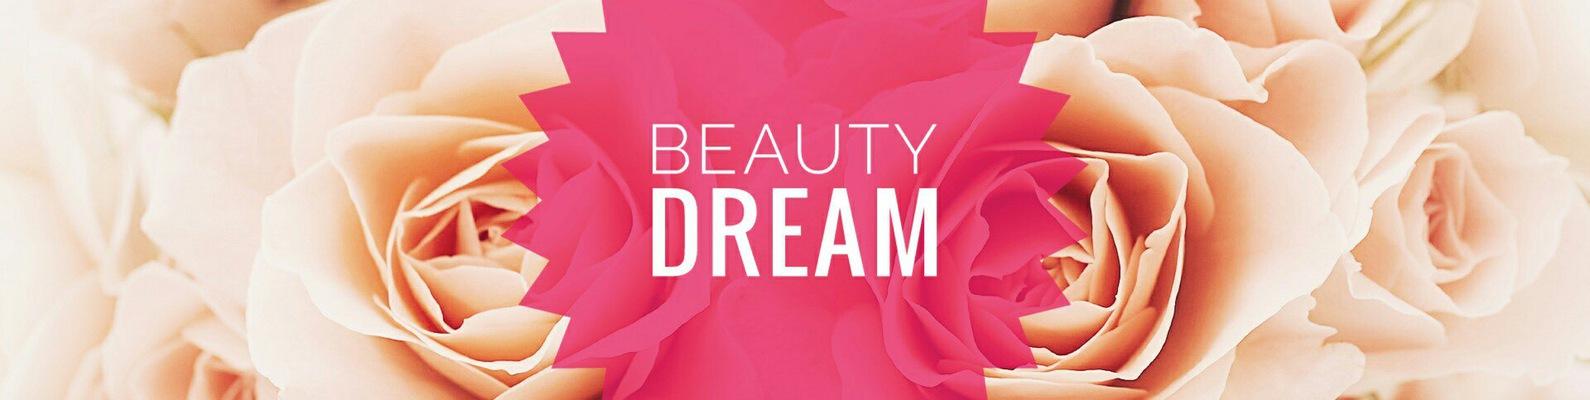 dream beauty Dream beauty link 2 - free online games - agamecom.